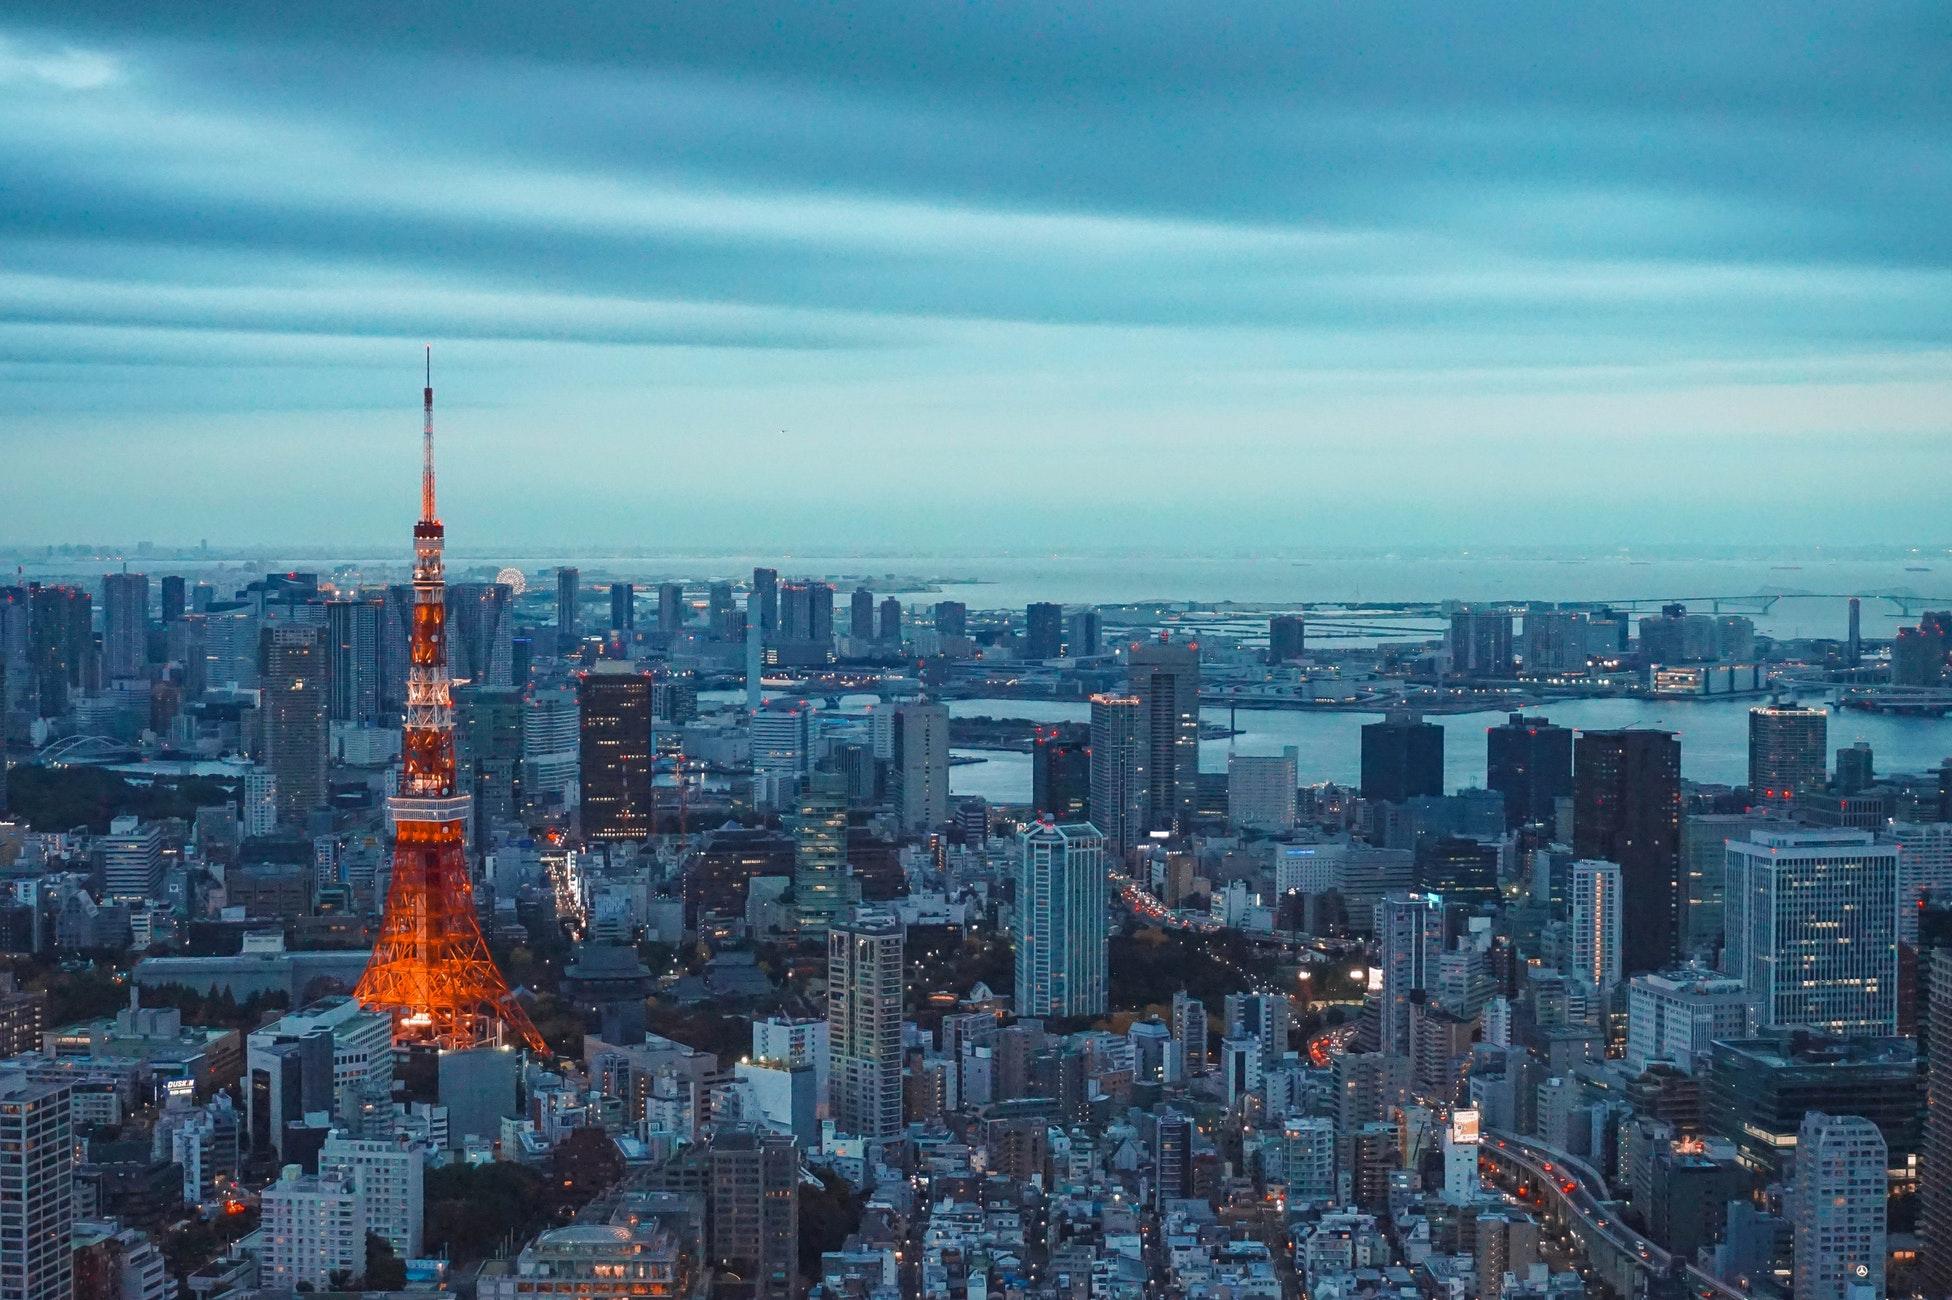 tokyo - Japan travel guide